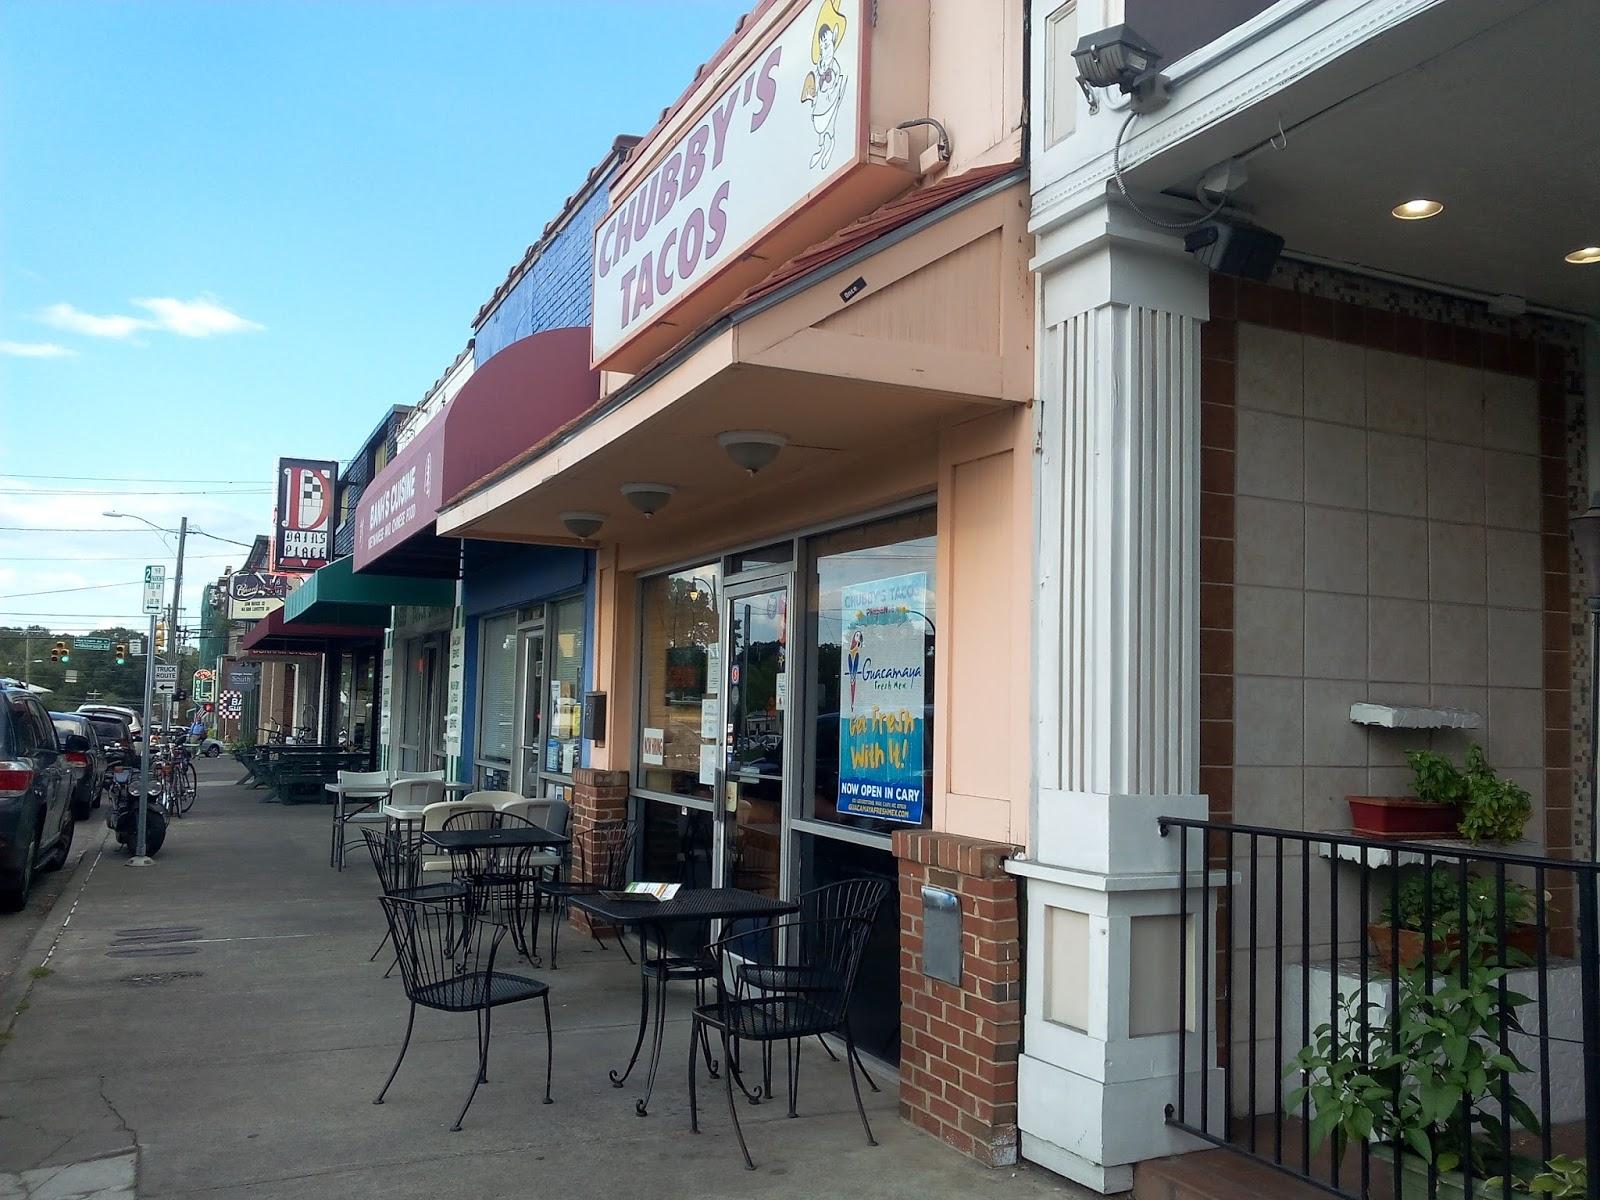 Durham, north carolina, usa, expatriation, 9th street, expatriation